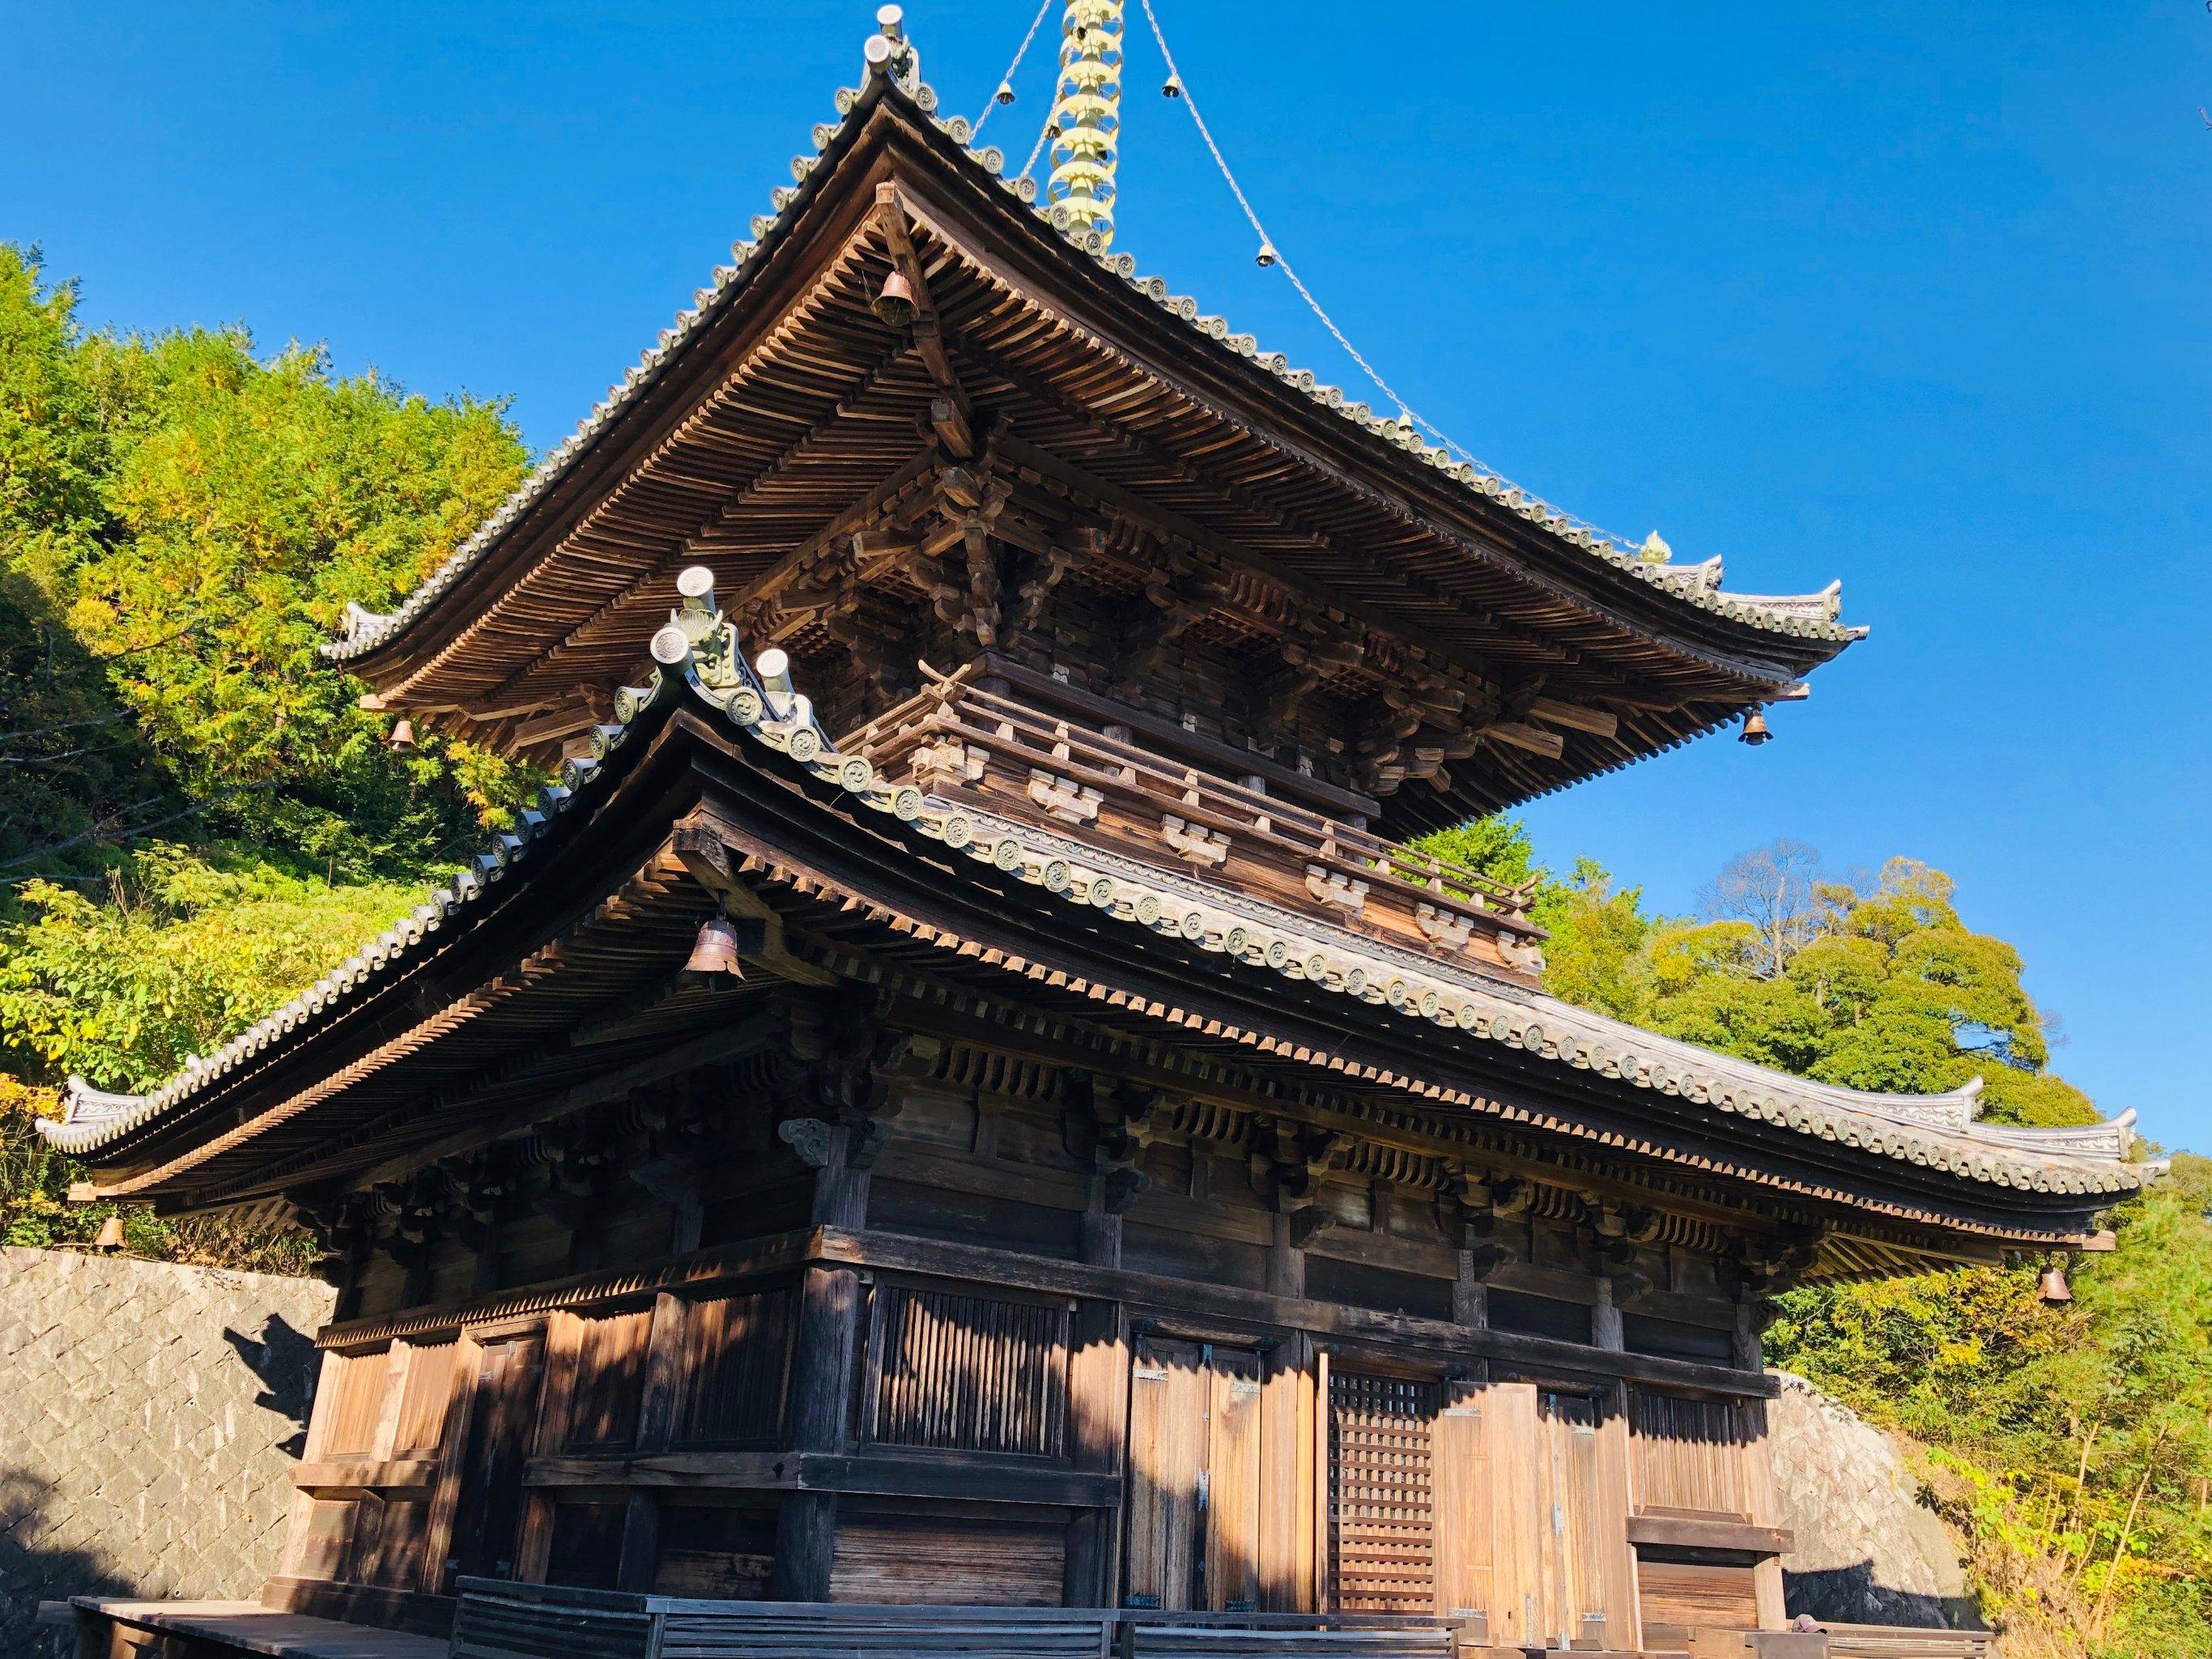 10-Day Private Ohenro Tour with Kochi, Iya and Takamatsu - Japan Itinerary